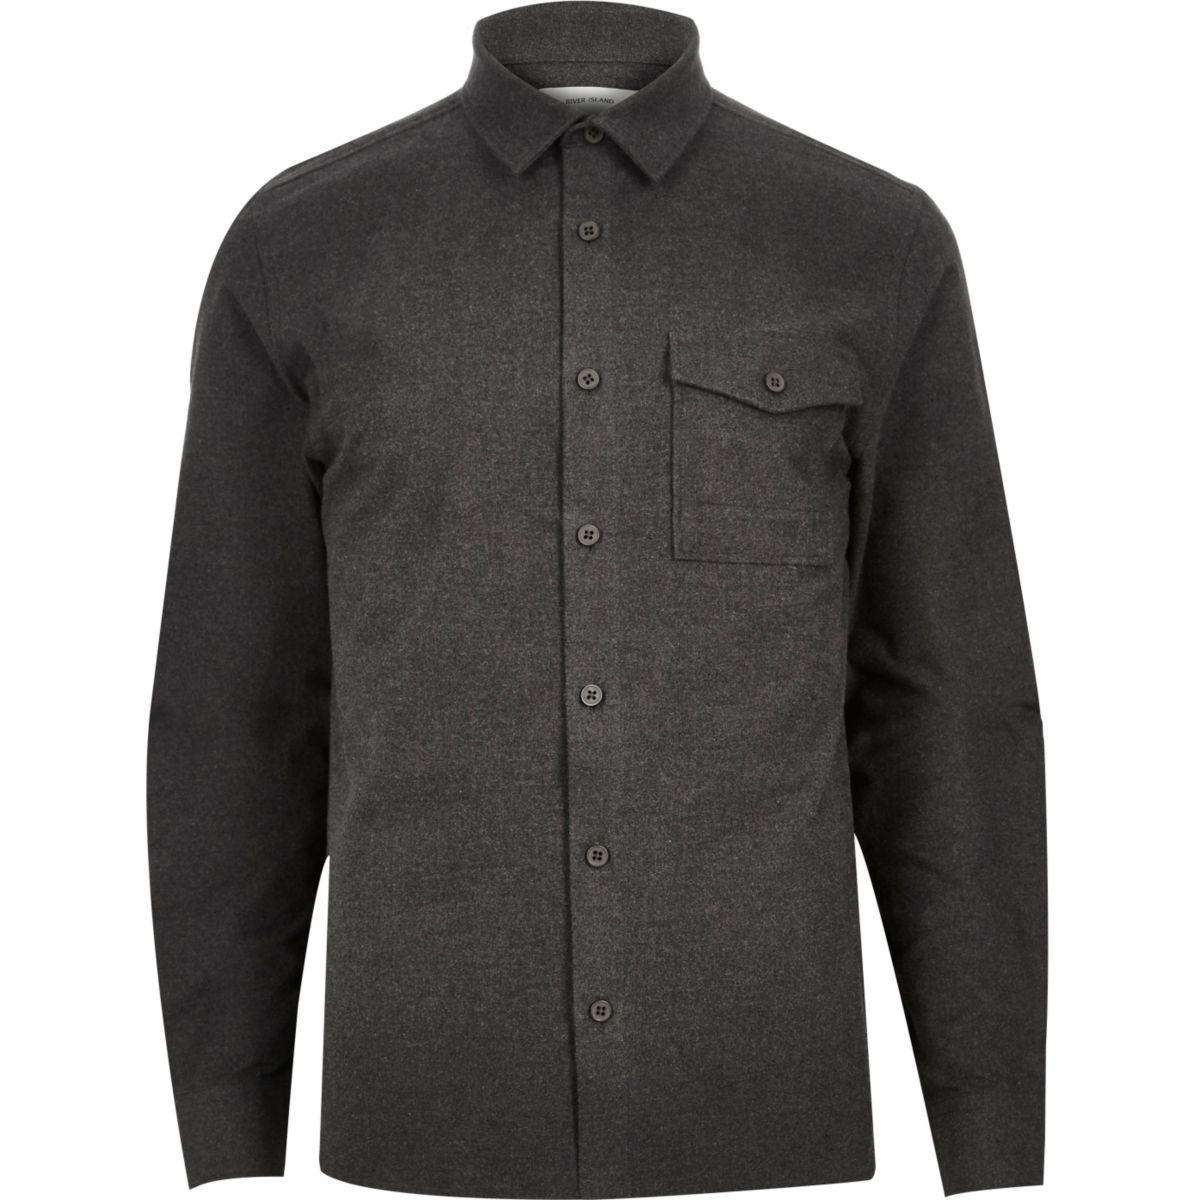 Charcoal grey flannel shirt